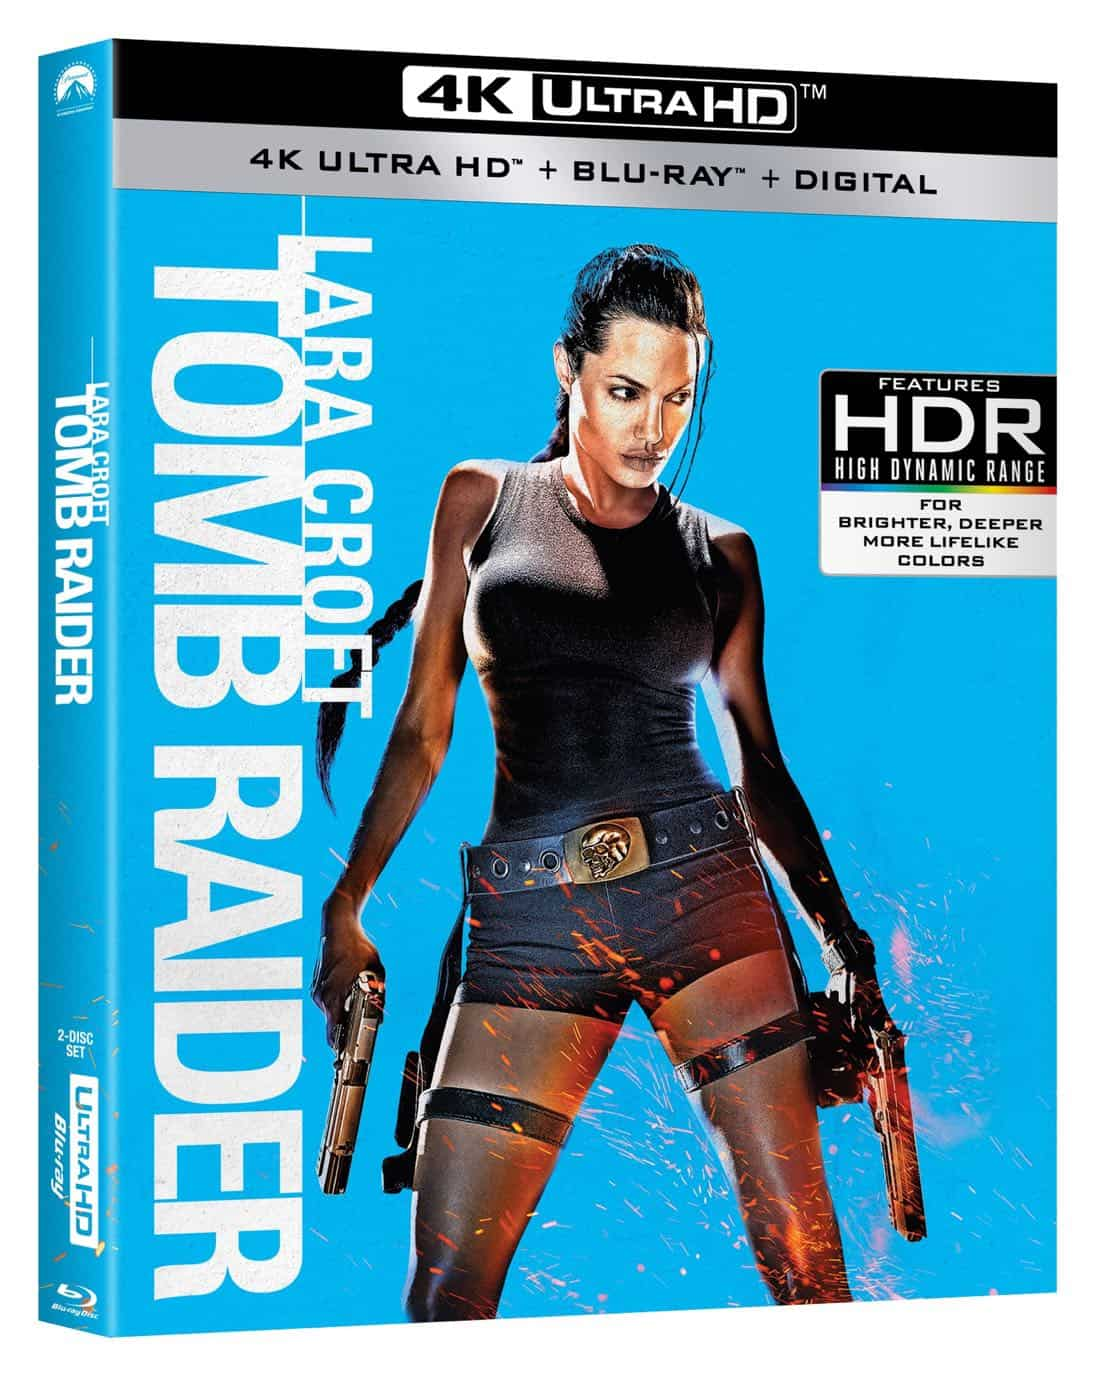 Lara-Croft-Tomb-Raider-4K-Ultra-HD-Bluray-Cover-1